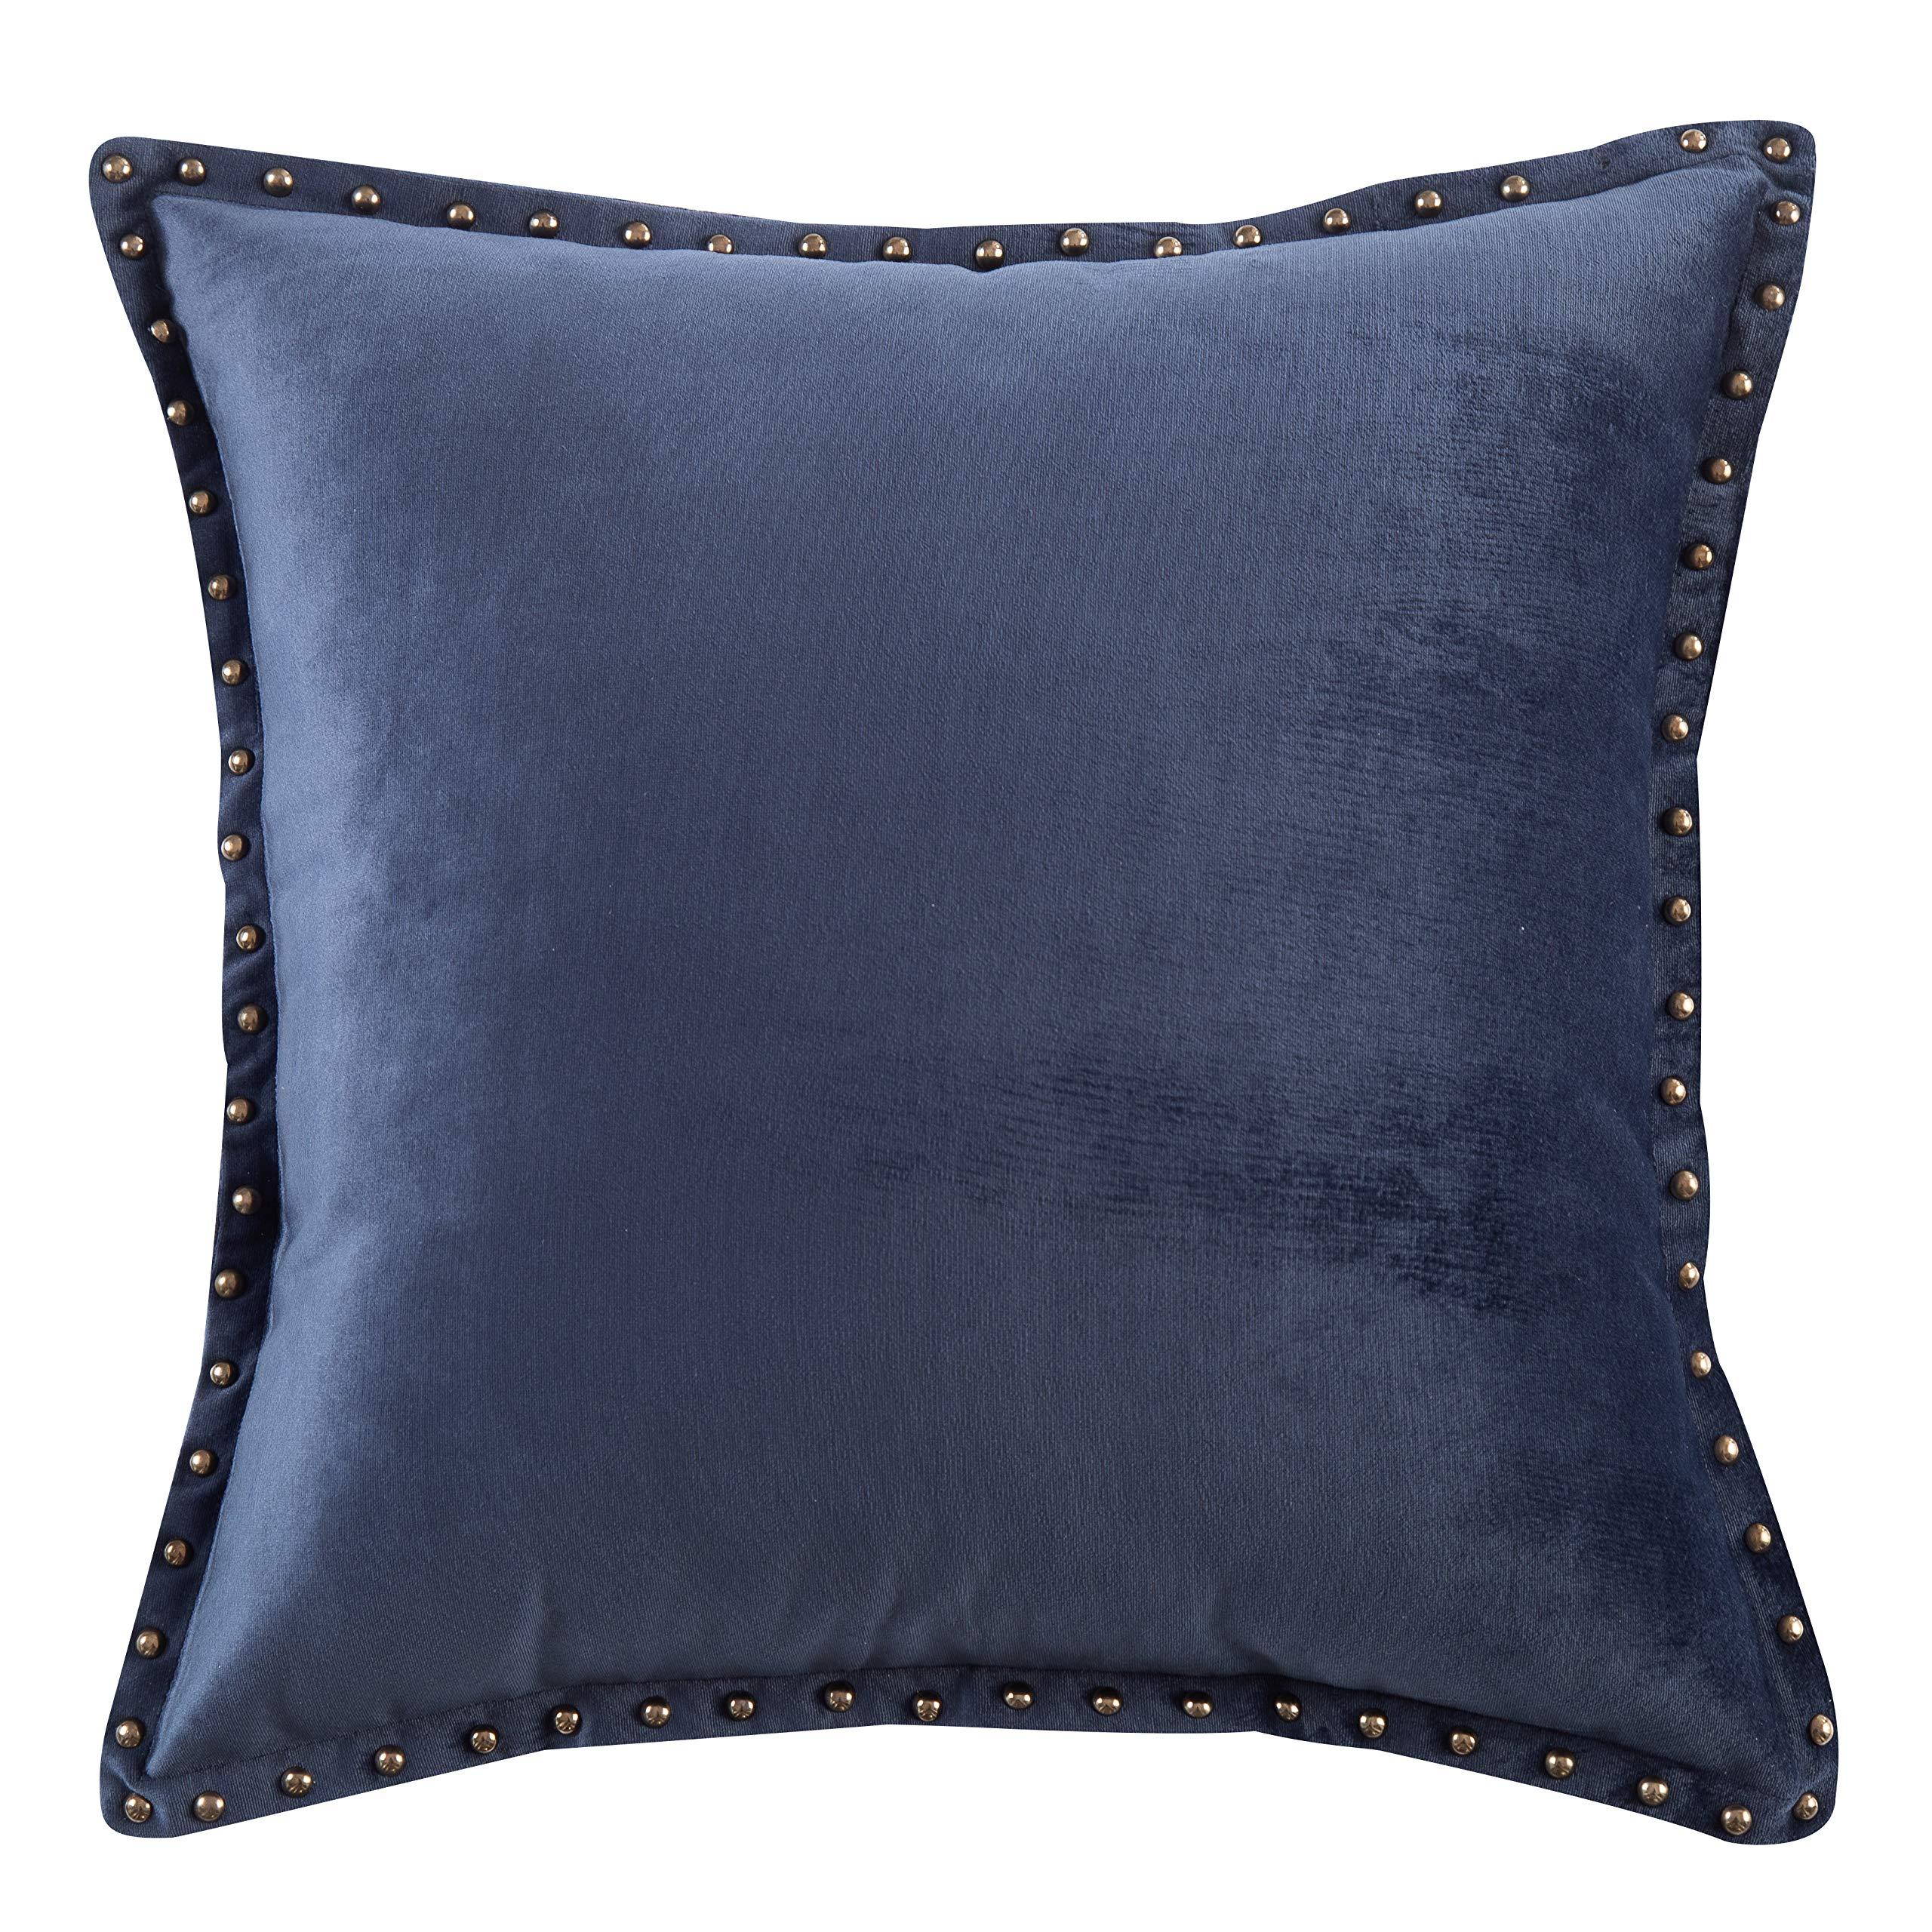 Modern Metallic Rivet Velvet Texture Decorative Throw Pillow Cover Home Office Decor Cushion Cover Square 20x20 Inch Navy